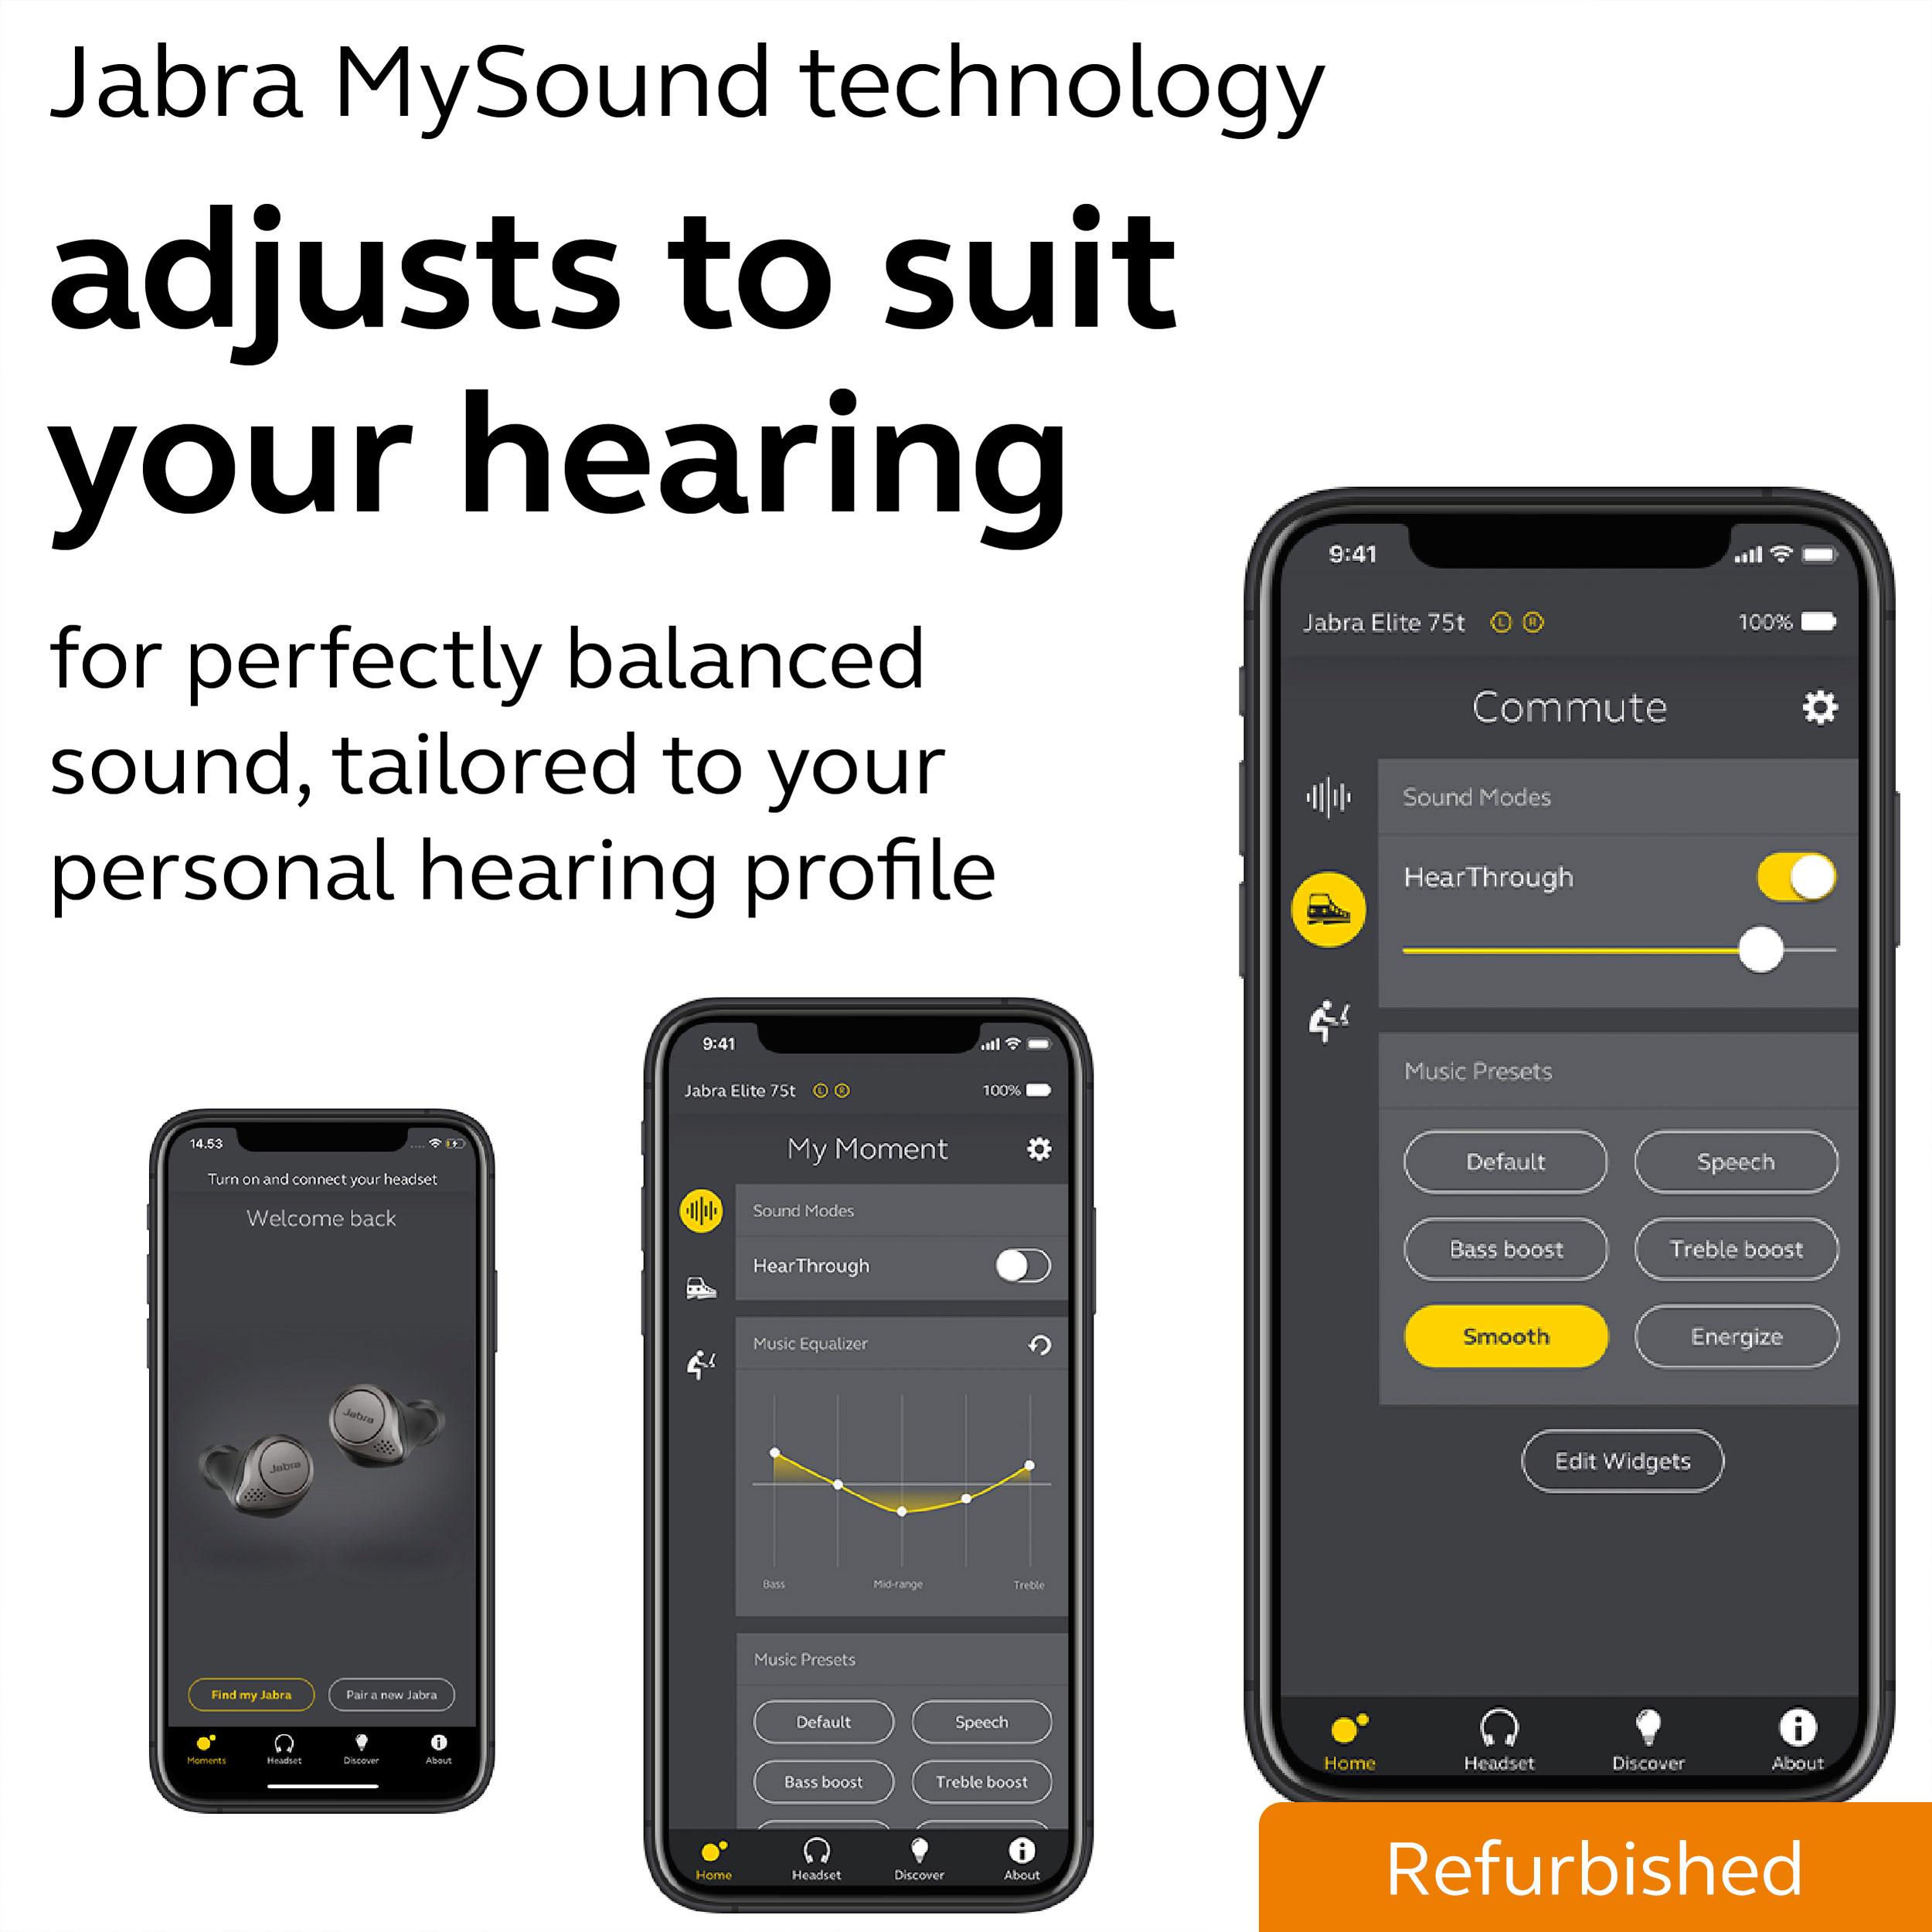 Jabra-Elite-75t-Voice-Assistant-True-Wireless-earbuds-Manufacturer-Refurbished thumbnail 21